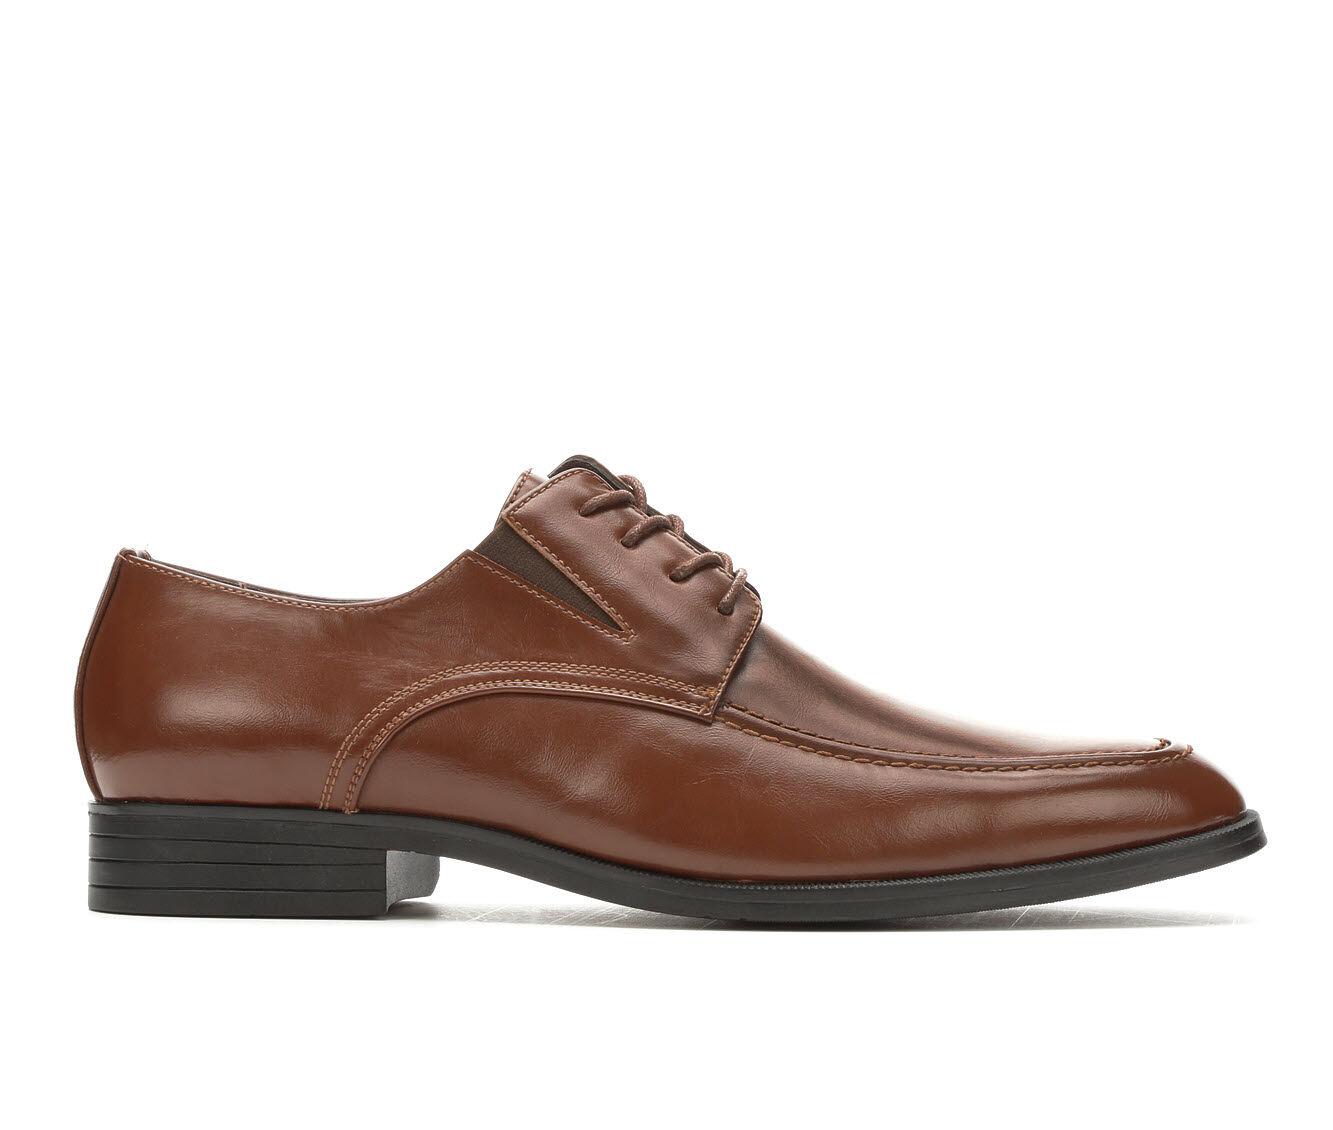 Men's Freeman Clayton Dress Shoes Saddle Tan